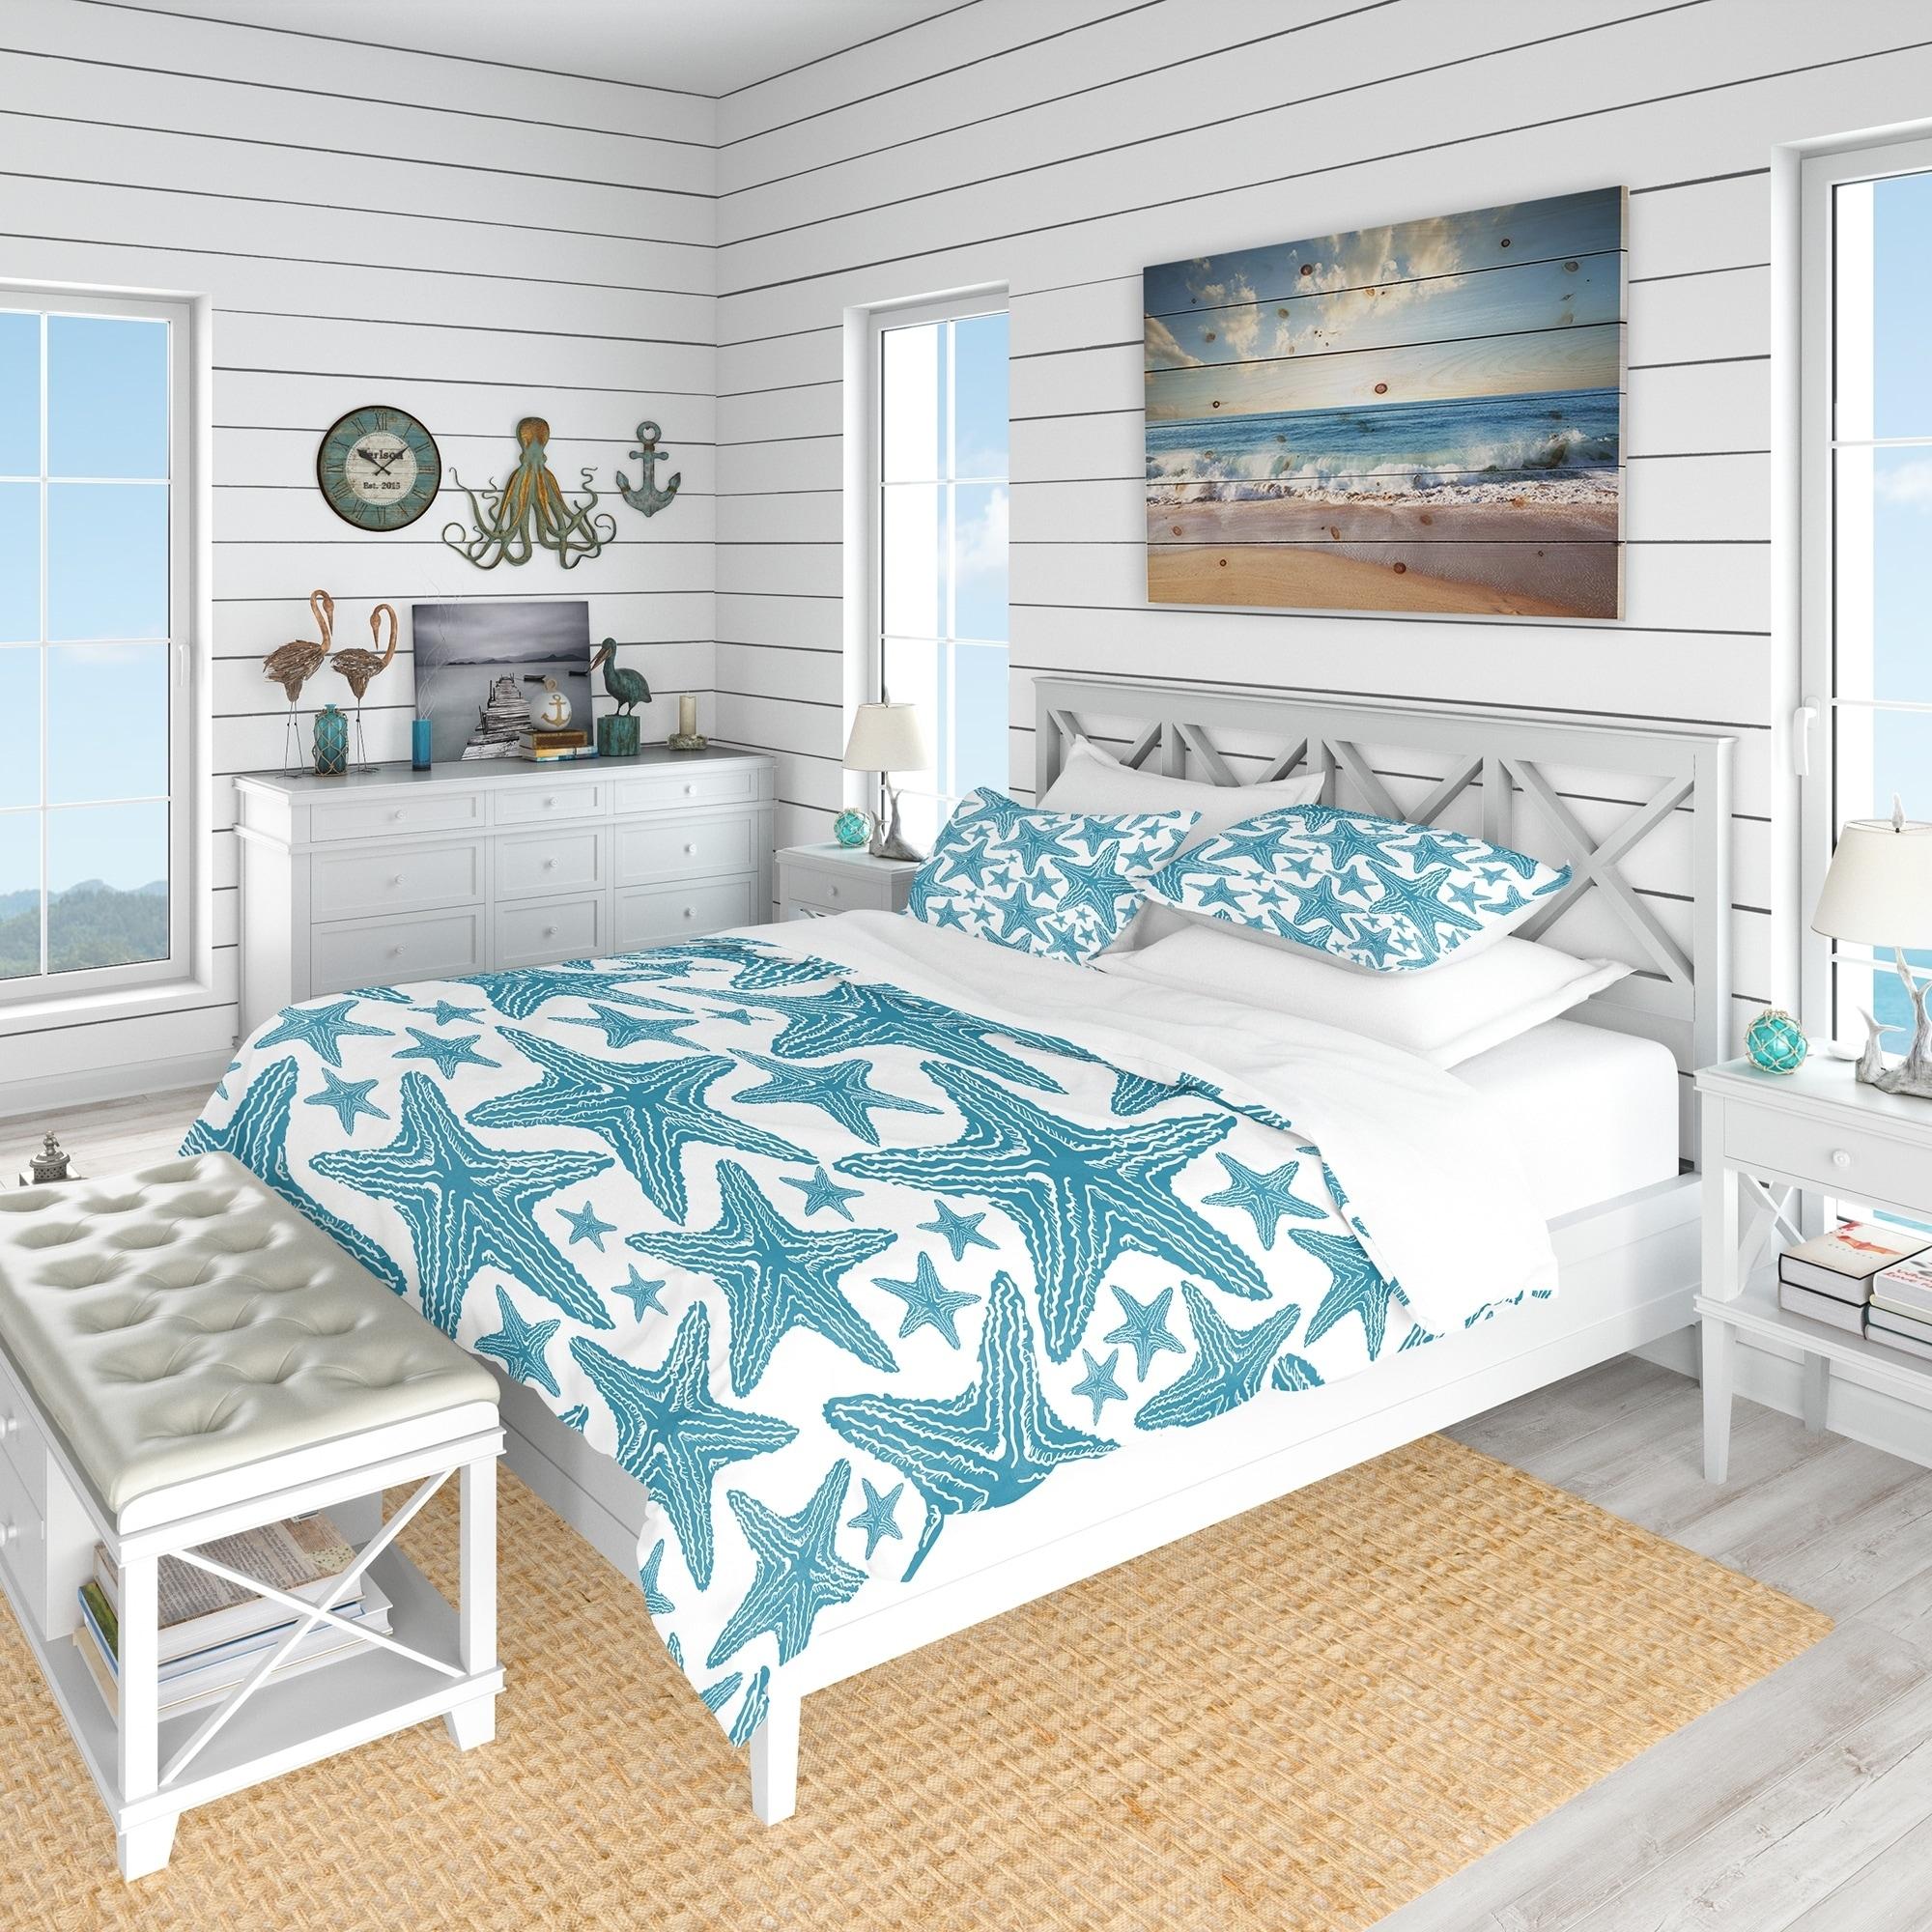 Designart Pattern Of Blue Starfish Coastal Bedding Set Duvet Cover Shams Overstock 23506317 Full Queen Cover 2 Shams Comforter Not Included